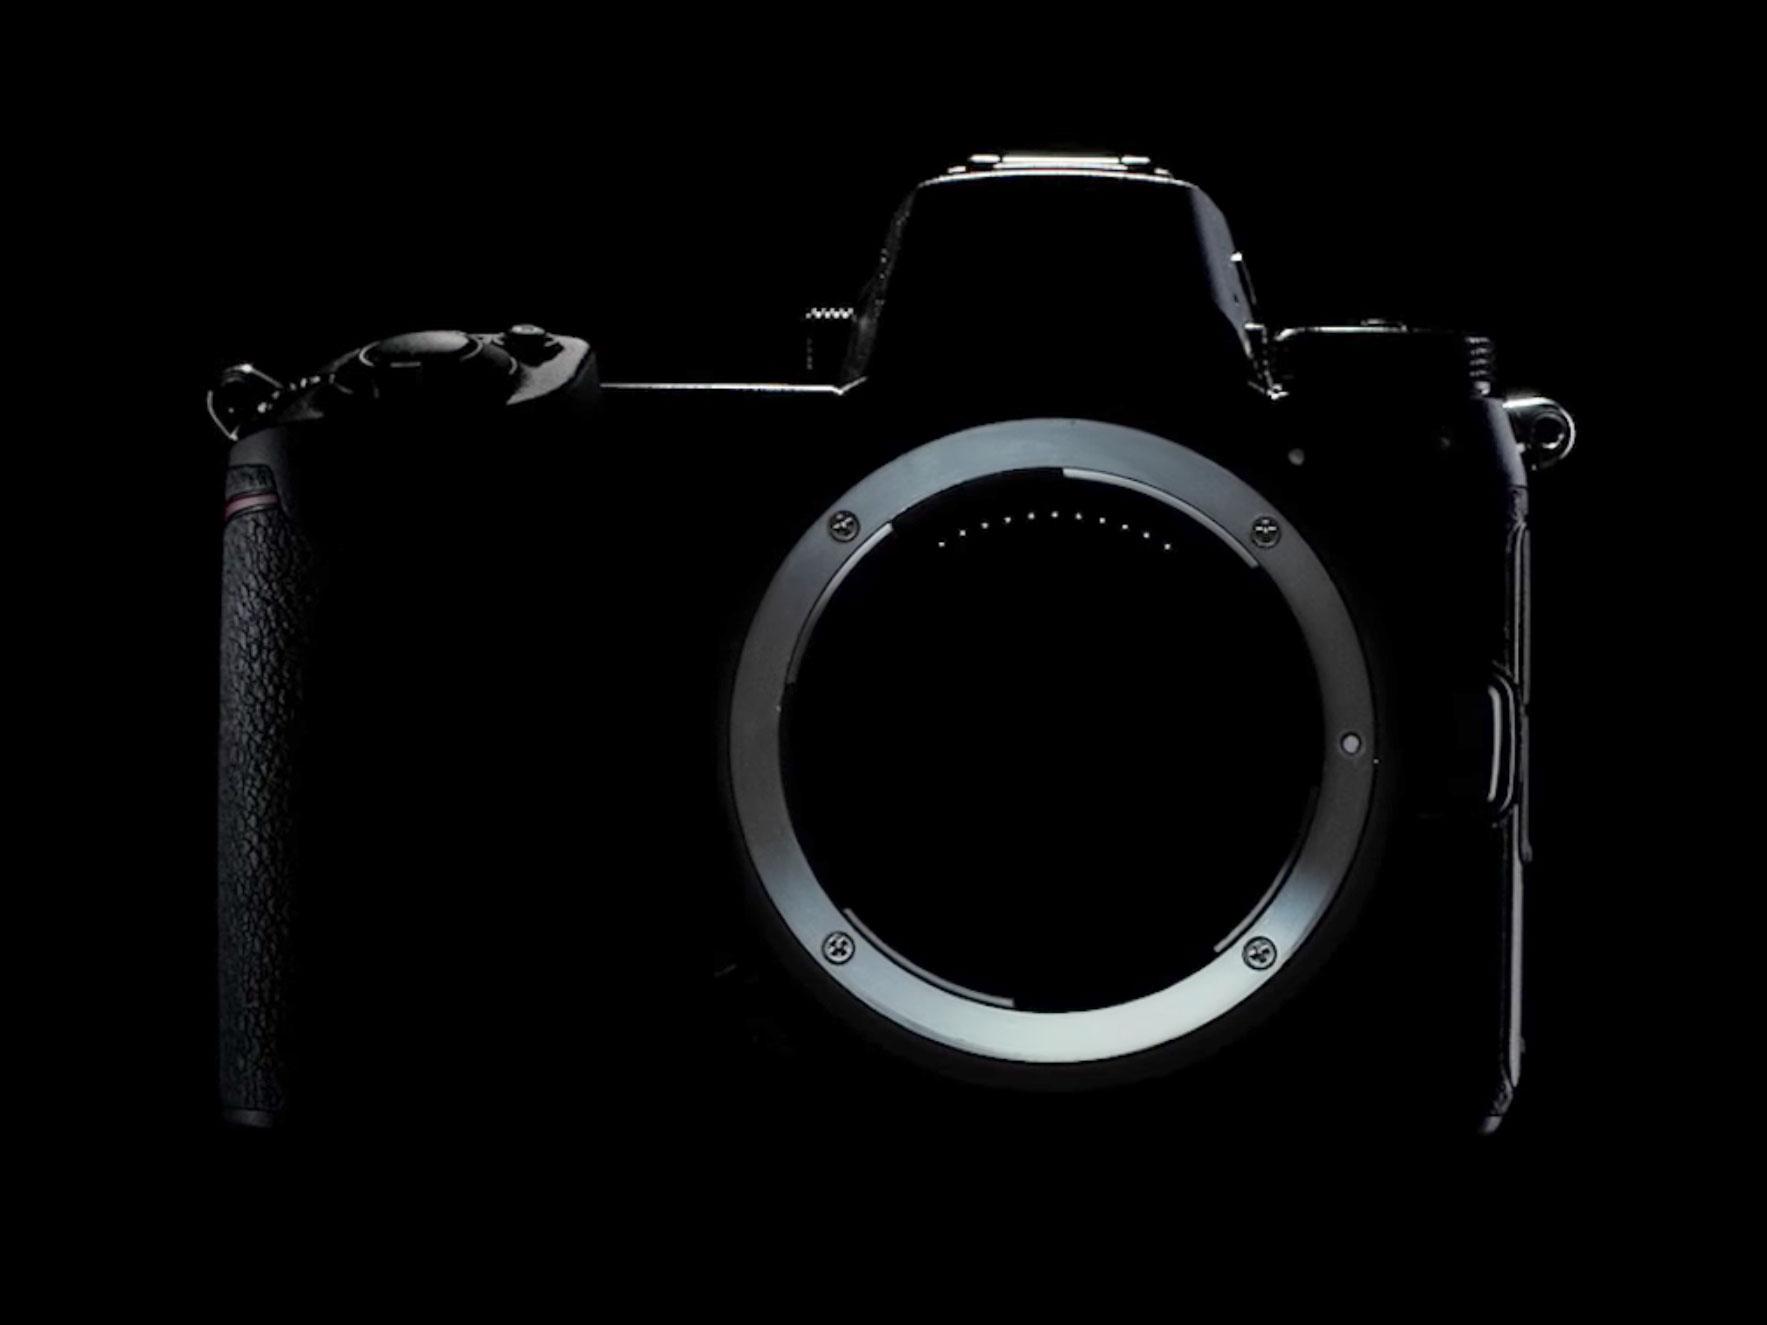 Video Stabilizer Hot Shoe Handle for Nikon Olympus Canon EOS Pentax DSLR Camera Black Color AUG/_14